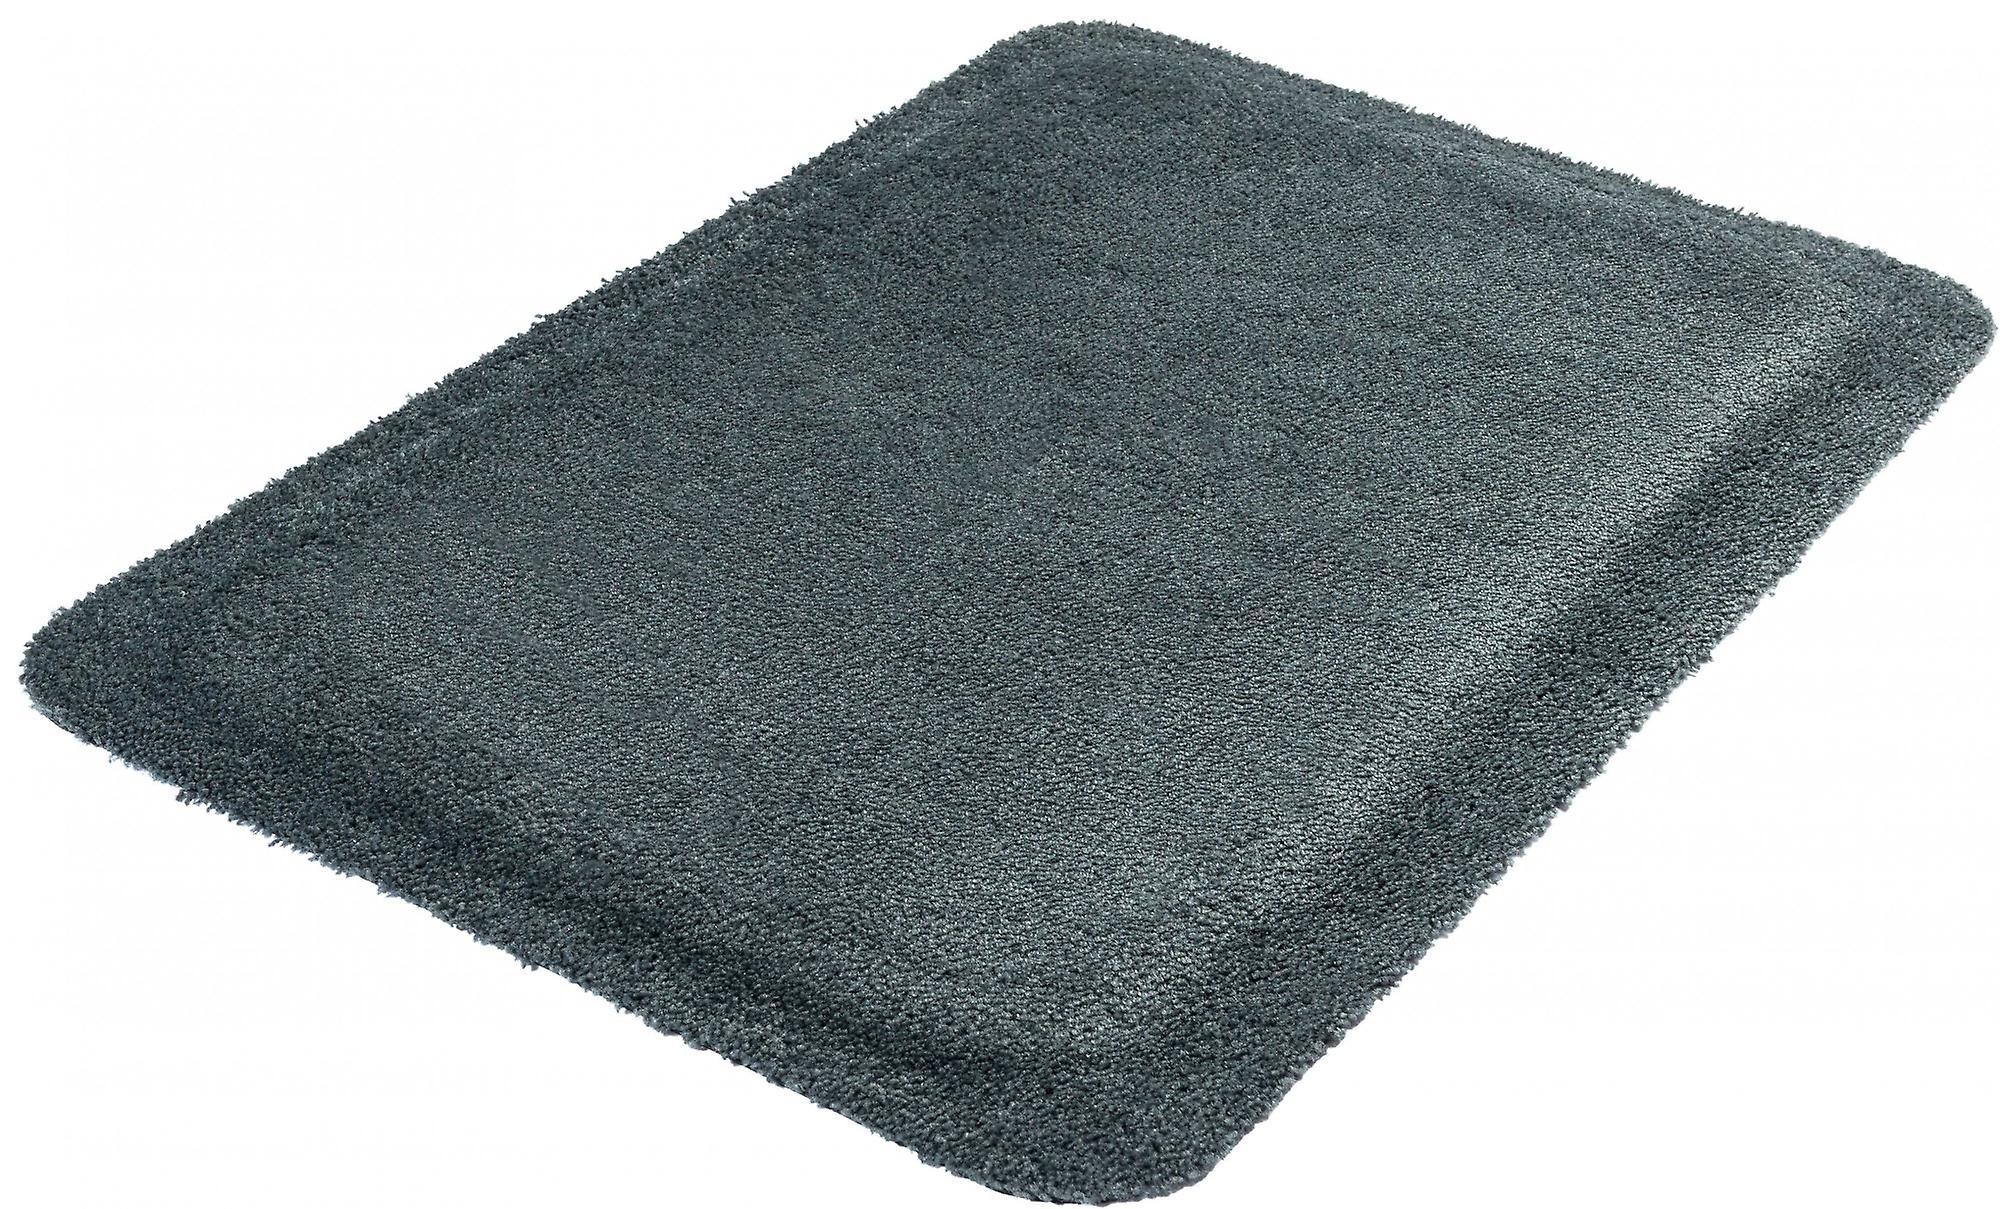 Anti-stand mat fatigue le Smokey monter lavage + sec